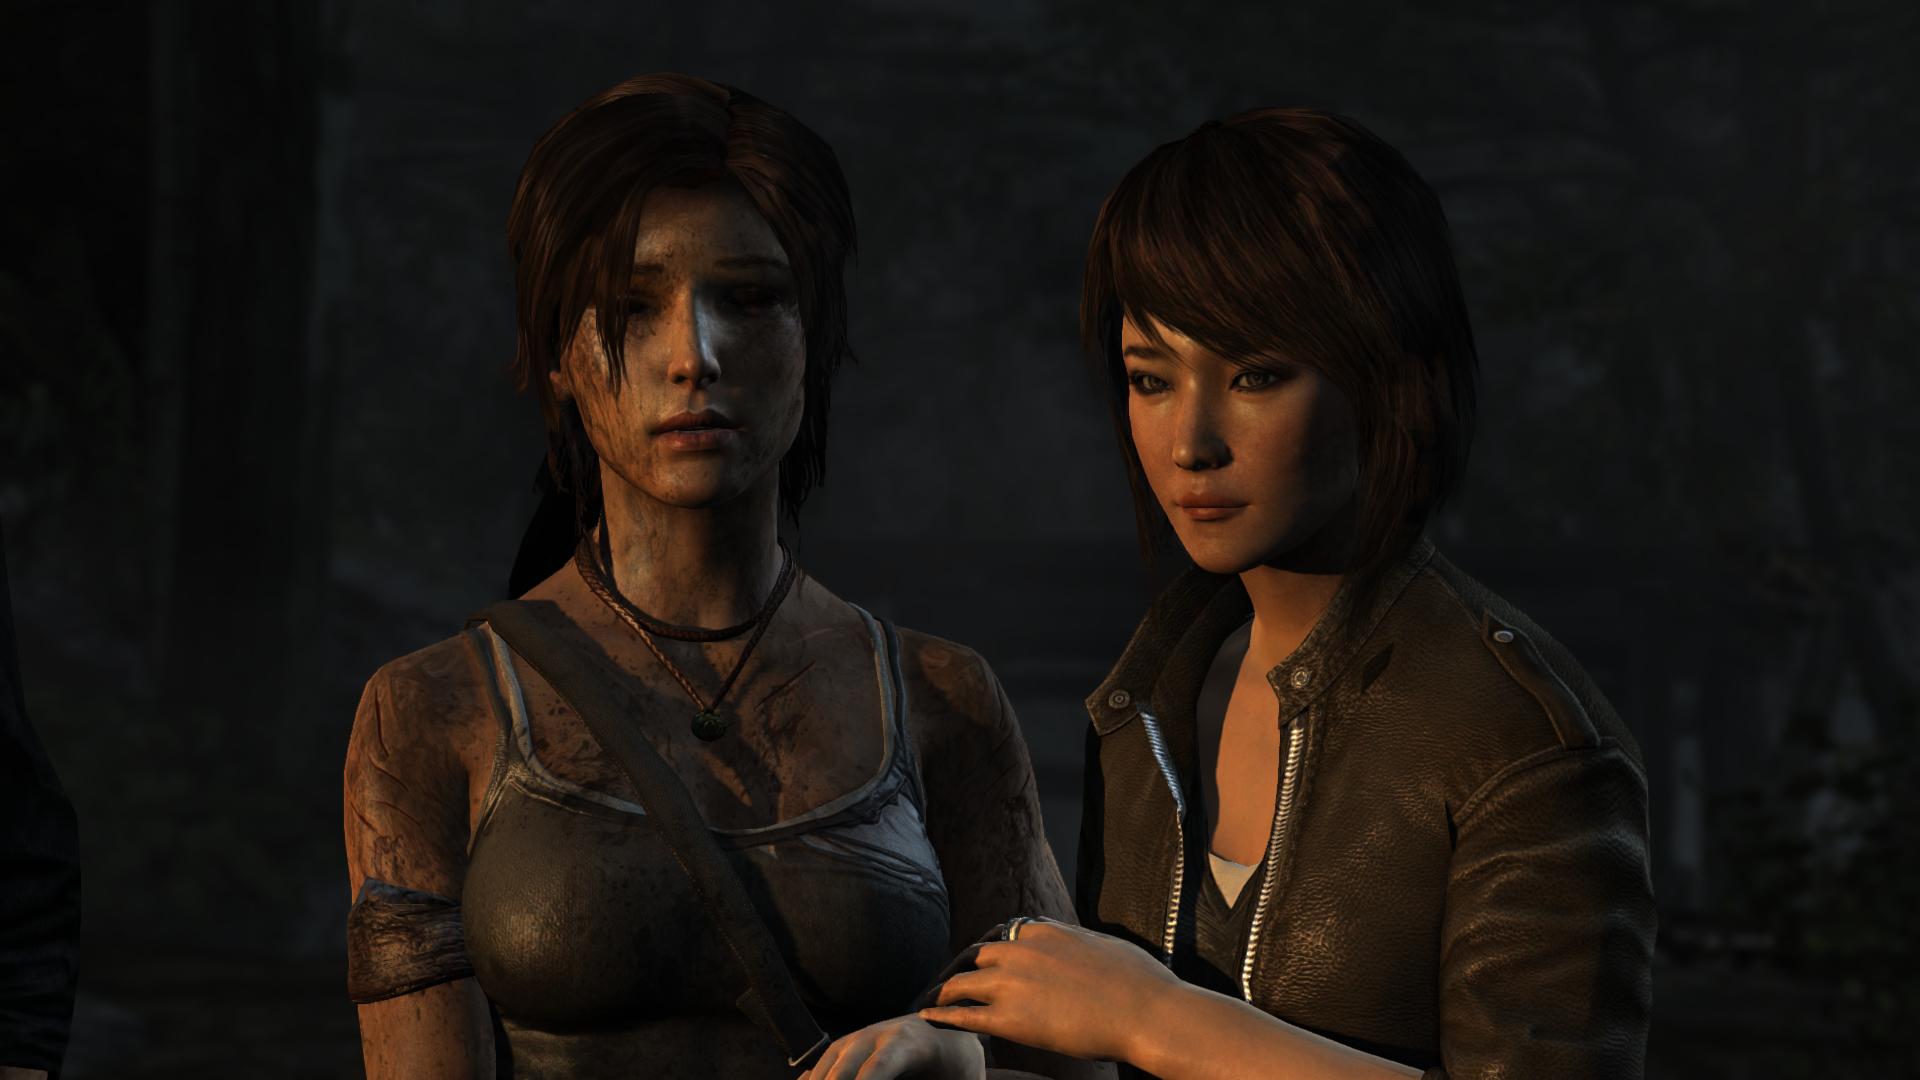 Lara Croft and Sam Nishimura in the 2013 Square Enix game Tomb Raider.